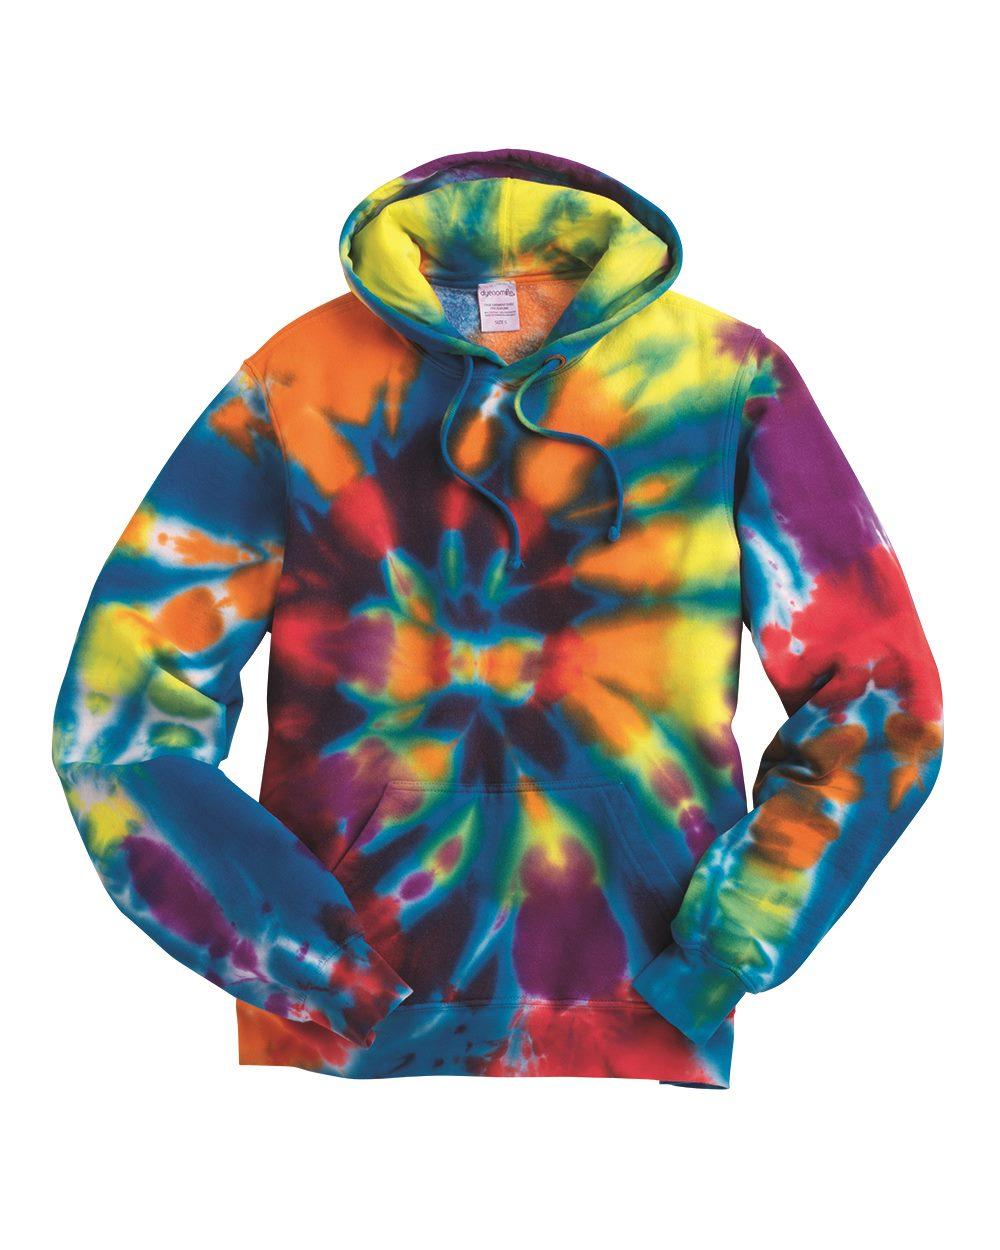 Tie-Dyed 854TD-Rainbow Multi-Color Cut-Spiral Hooded Sweatshirt